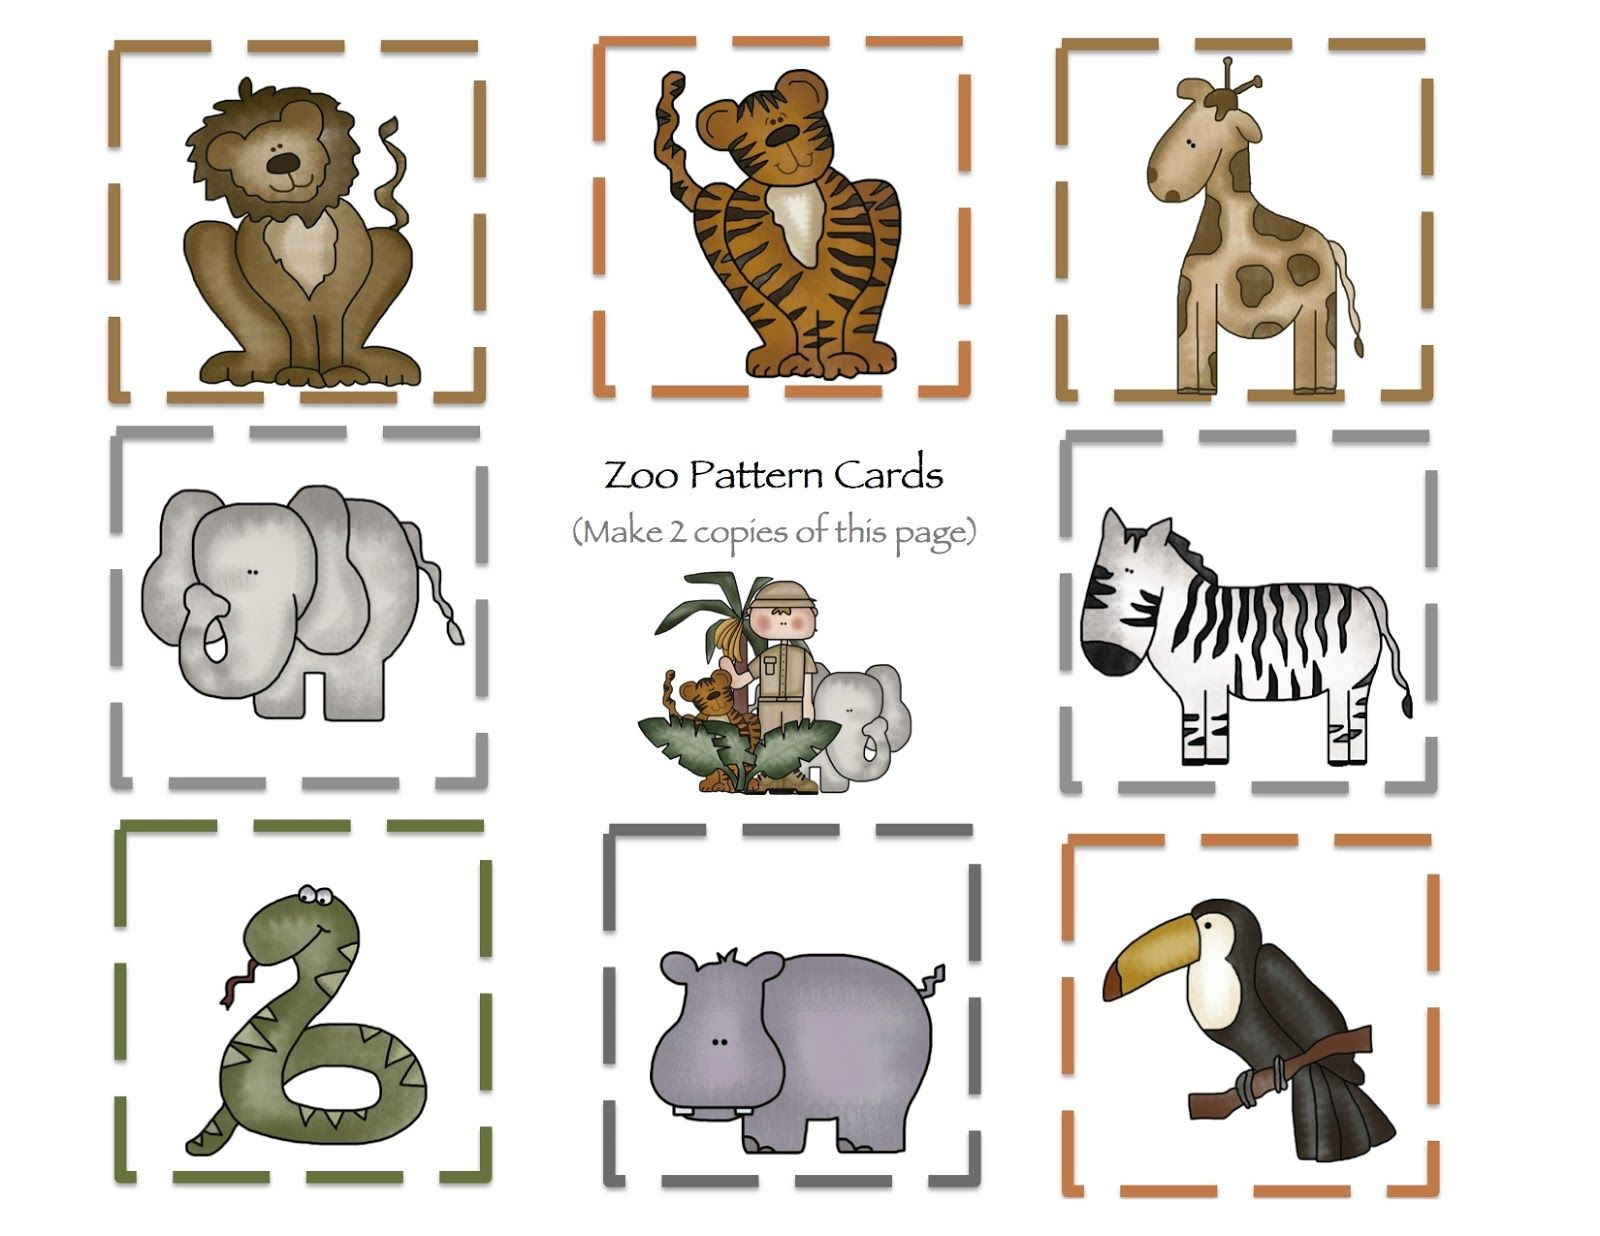 Preschool Printables Zoo Animals Preschool Preschool Zoo Theme Preschool Printables [ 1236 x 1600 Pixel ]